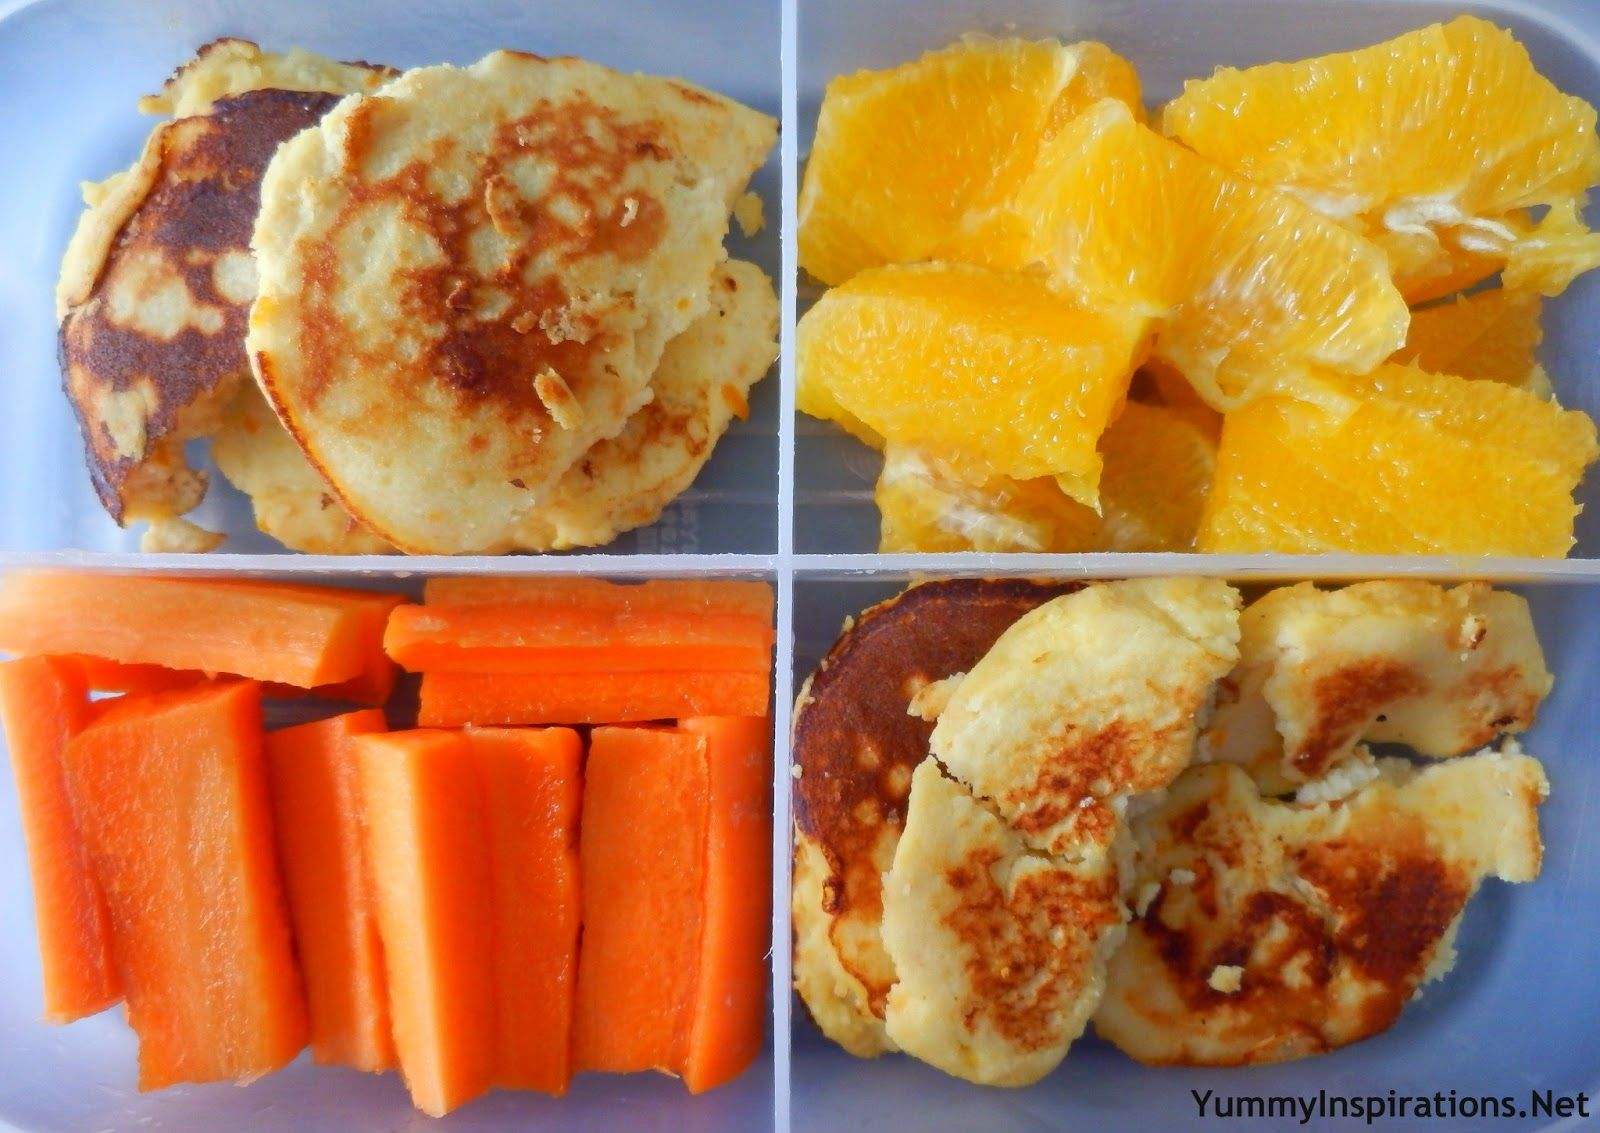 Orange Themed Lunch Box